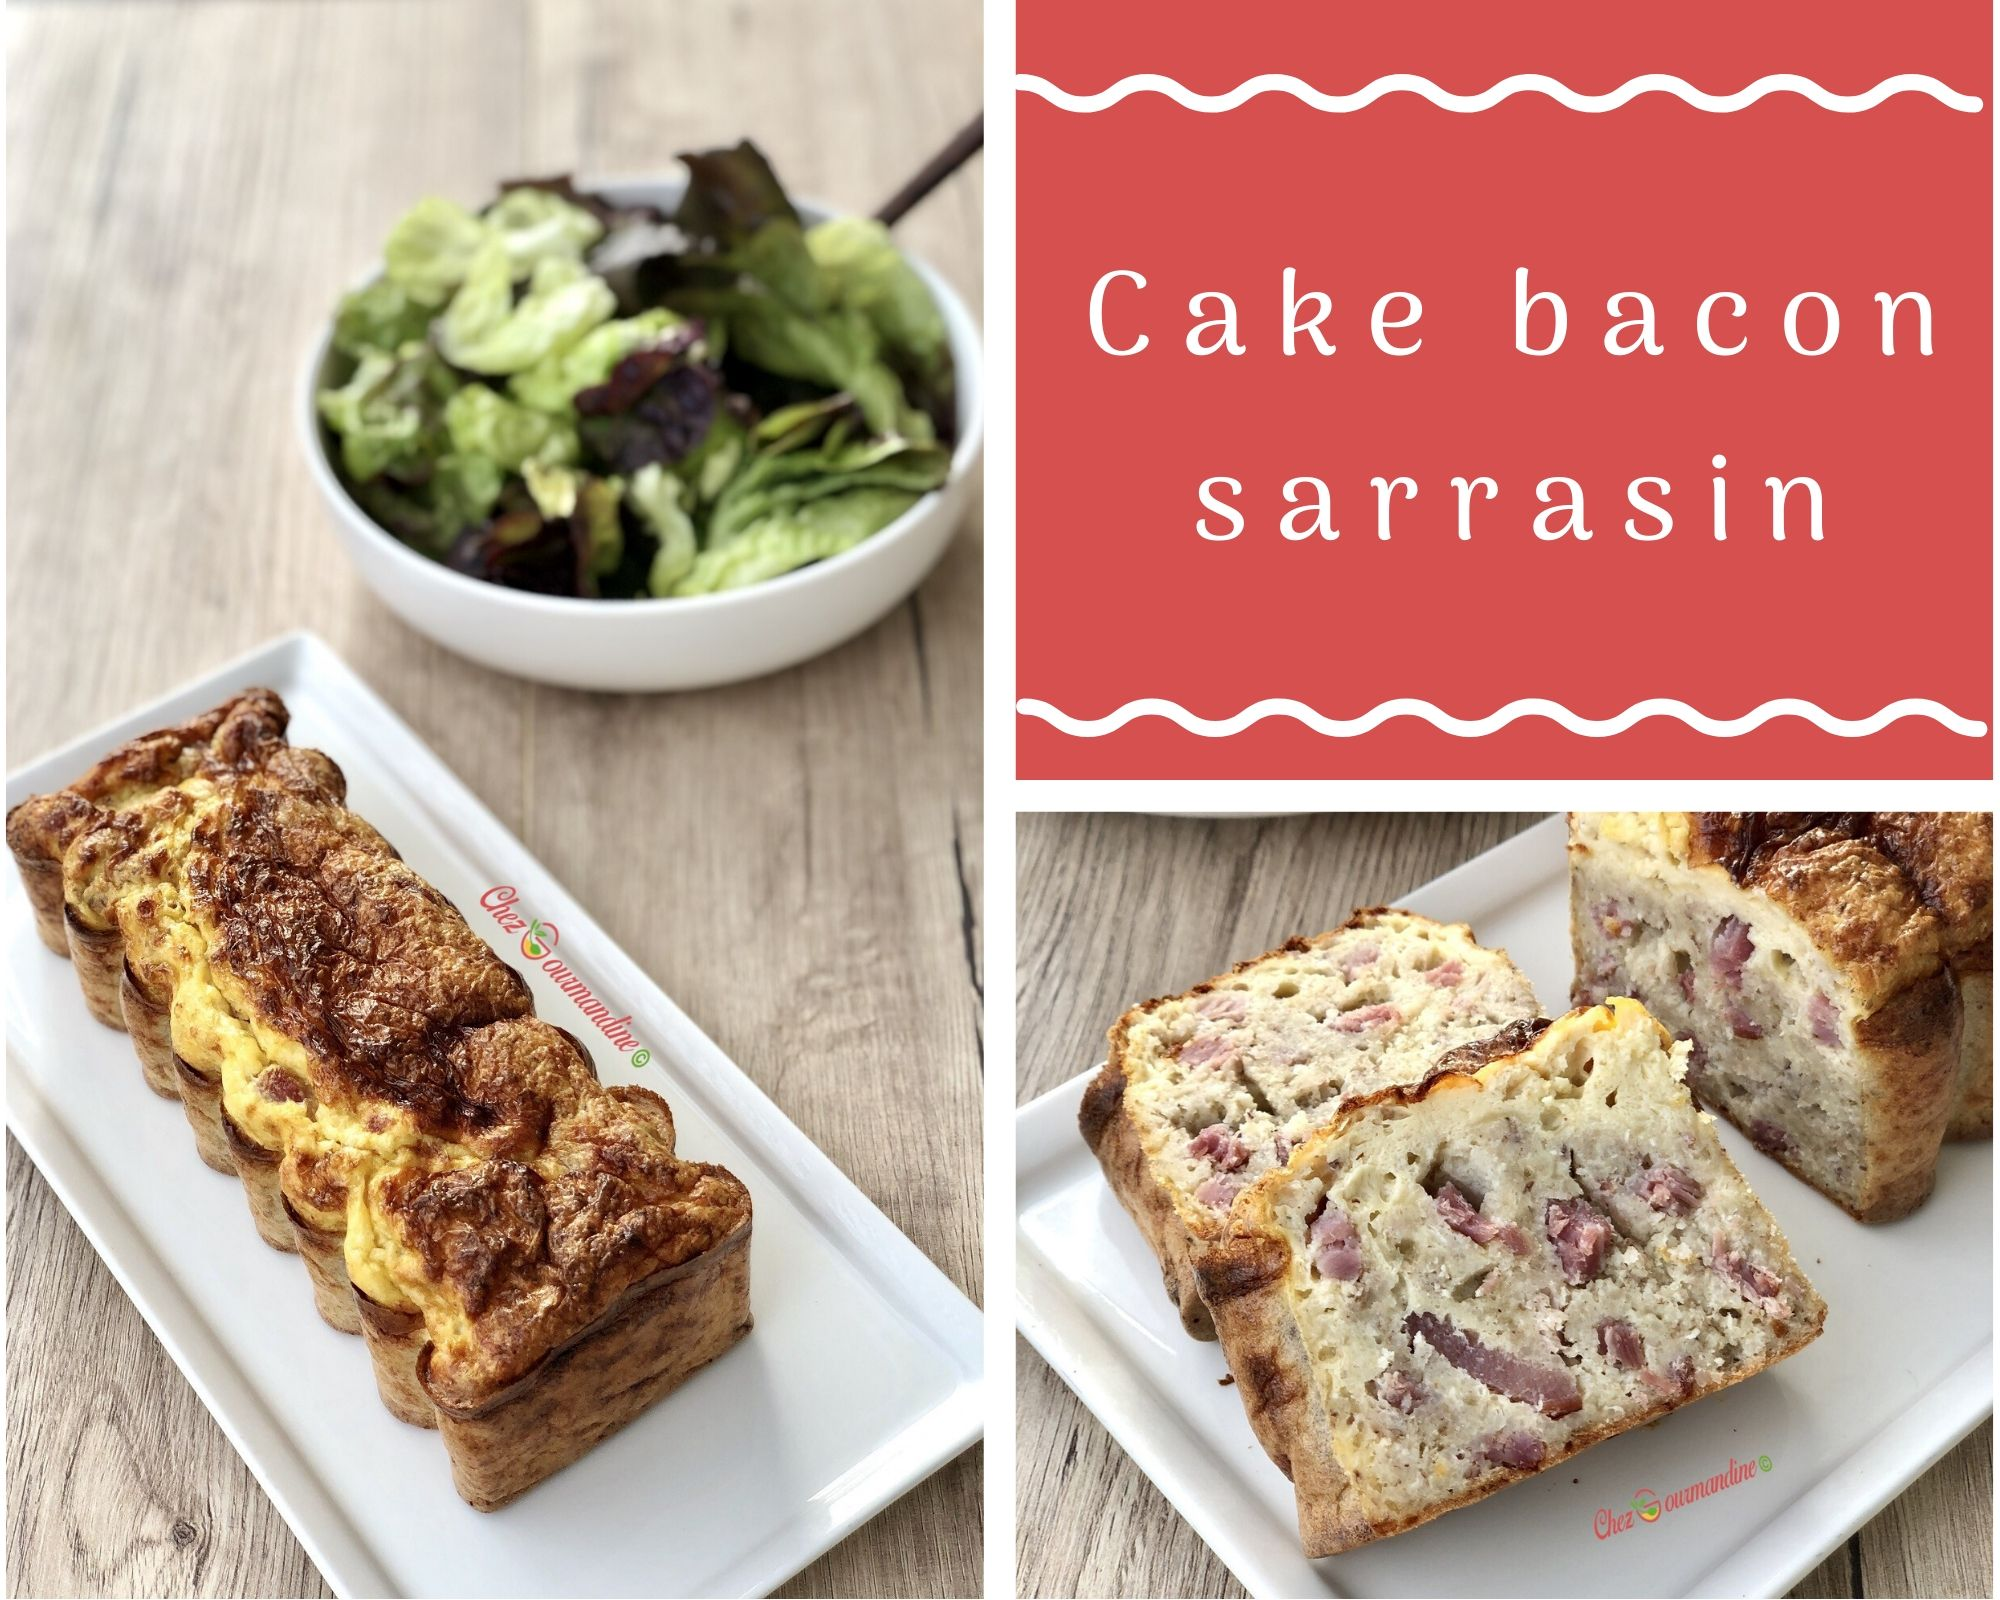 Cake bacon sarrasin